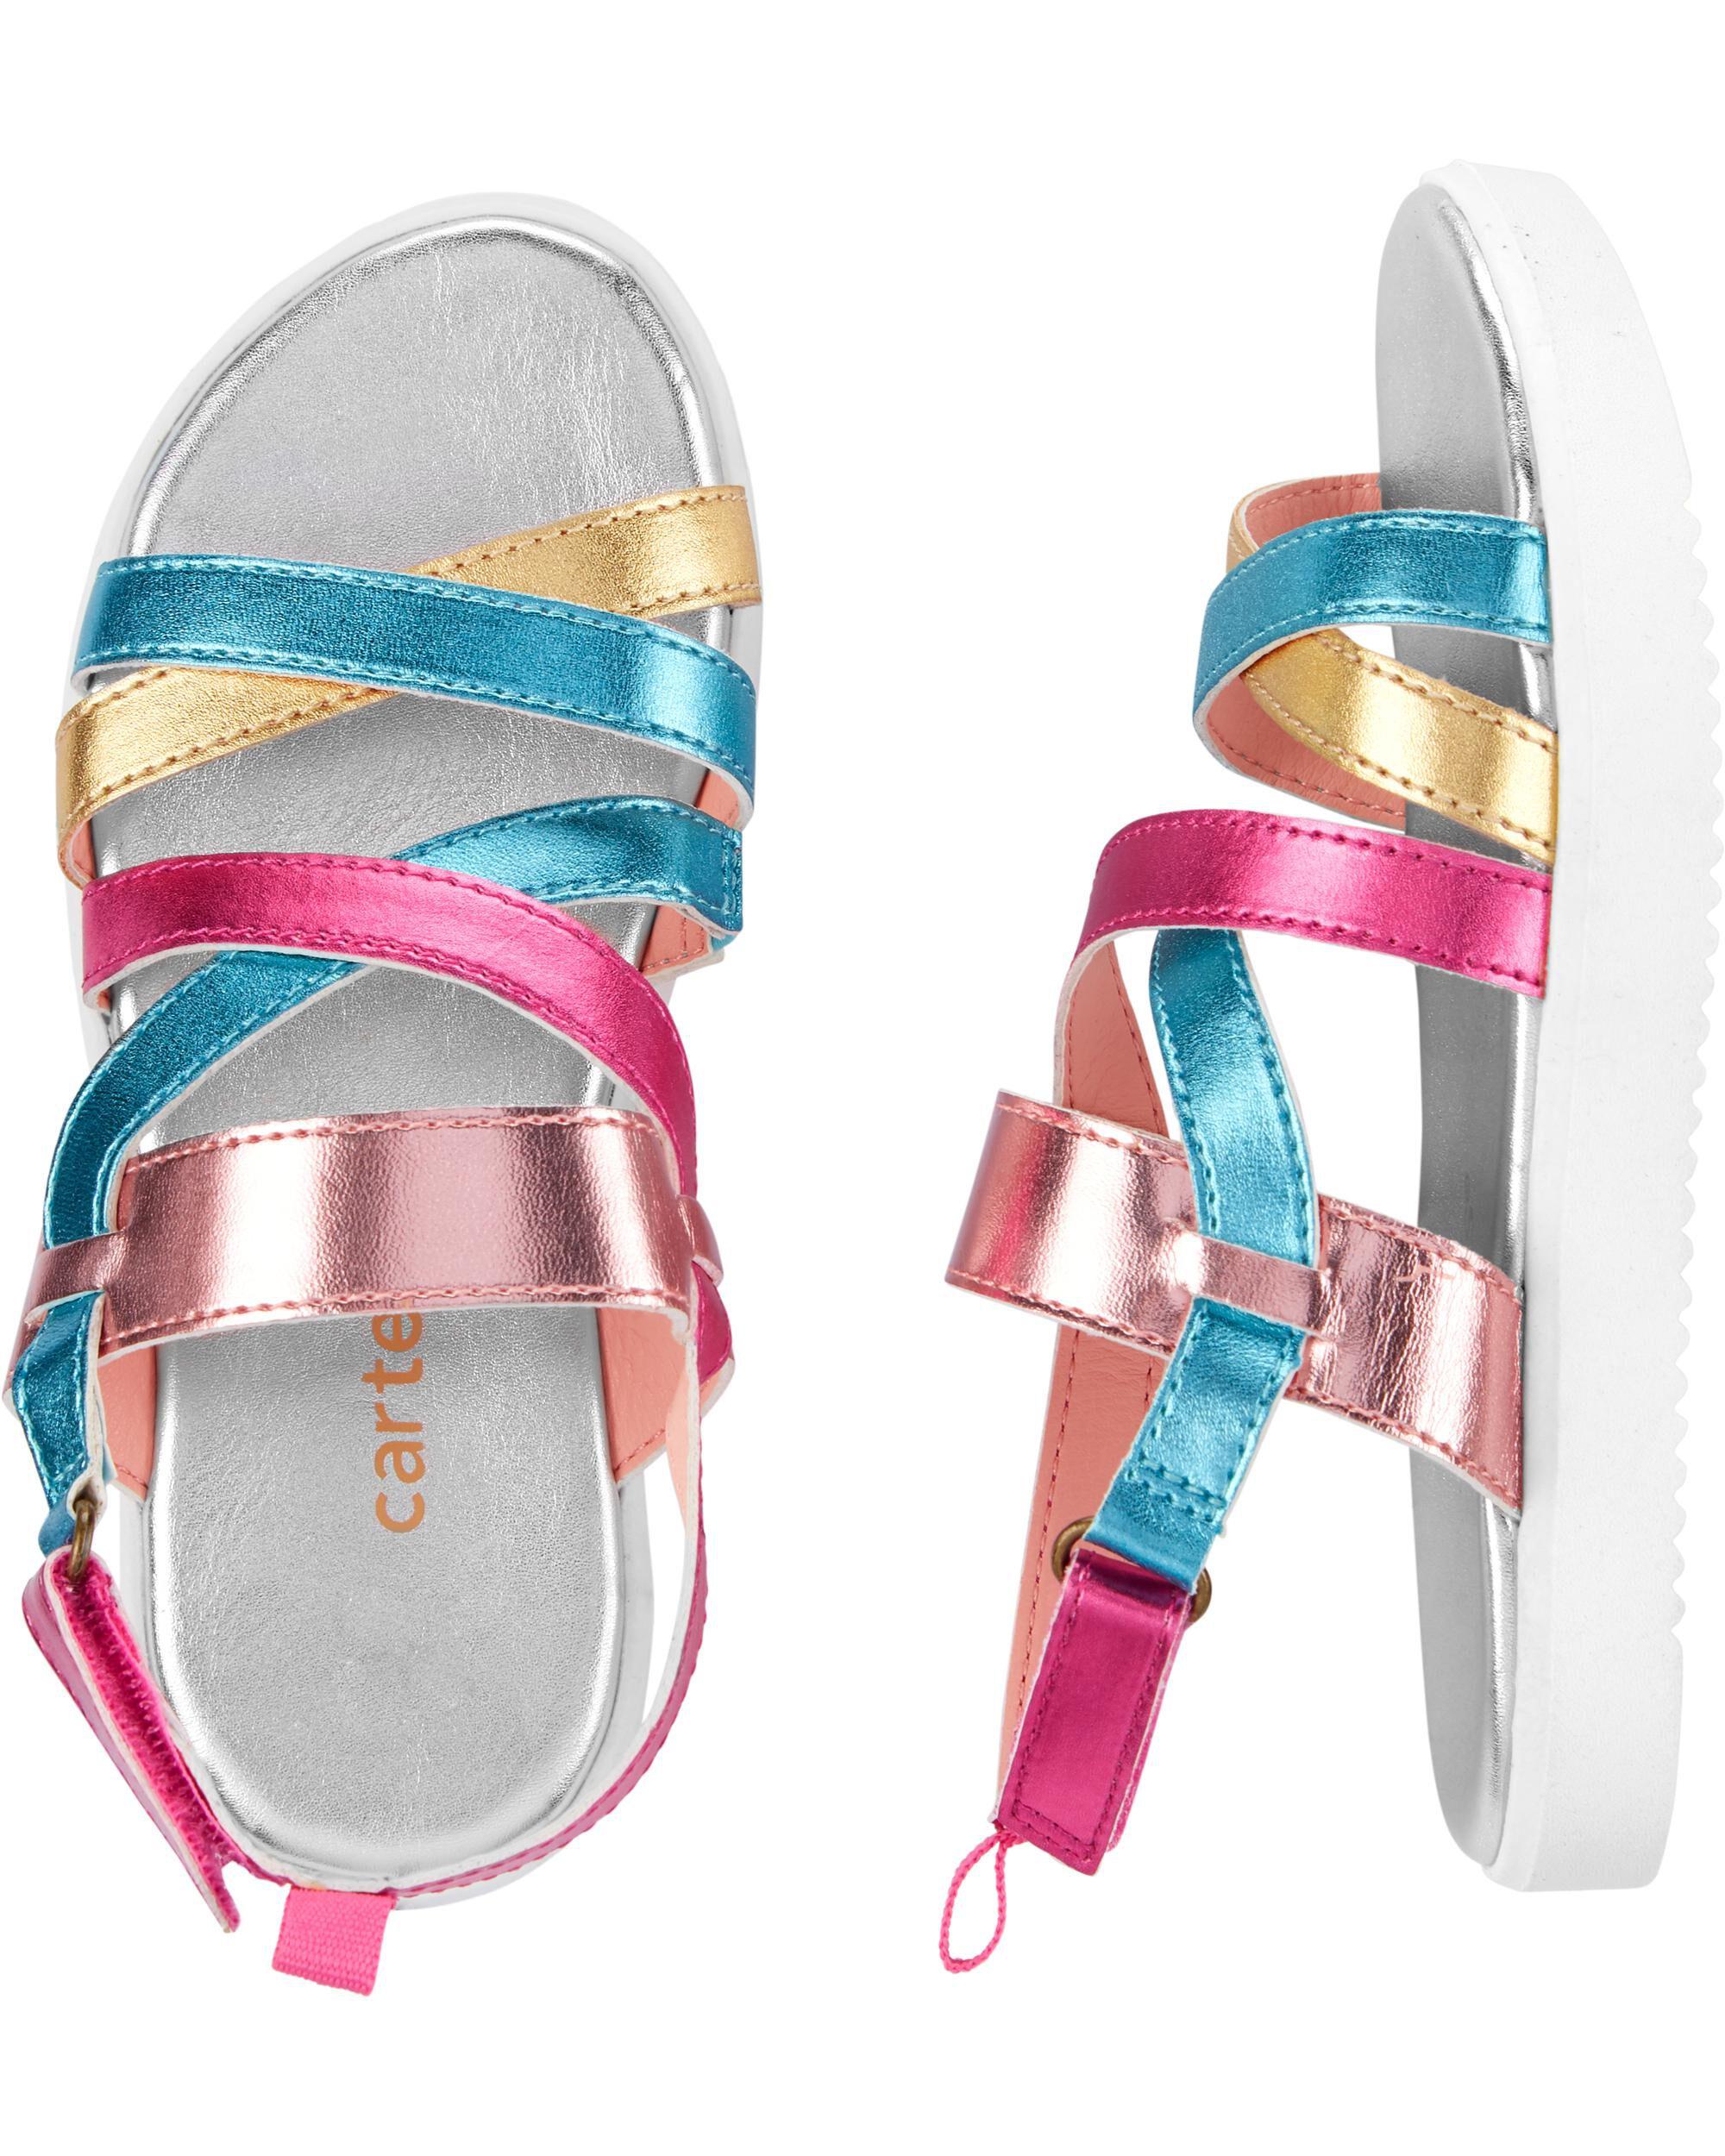 Carter's Platform Sandals | carters.com